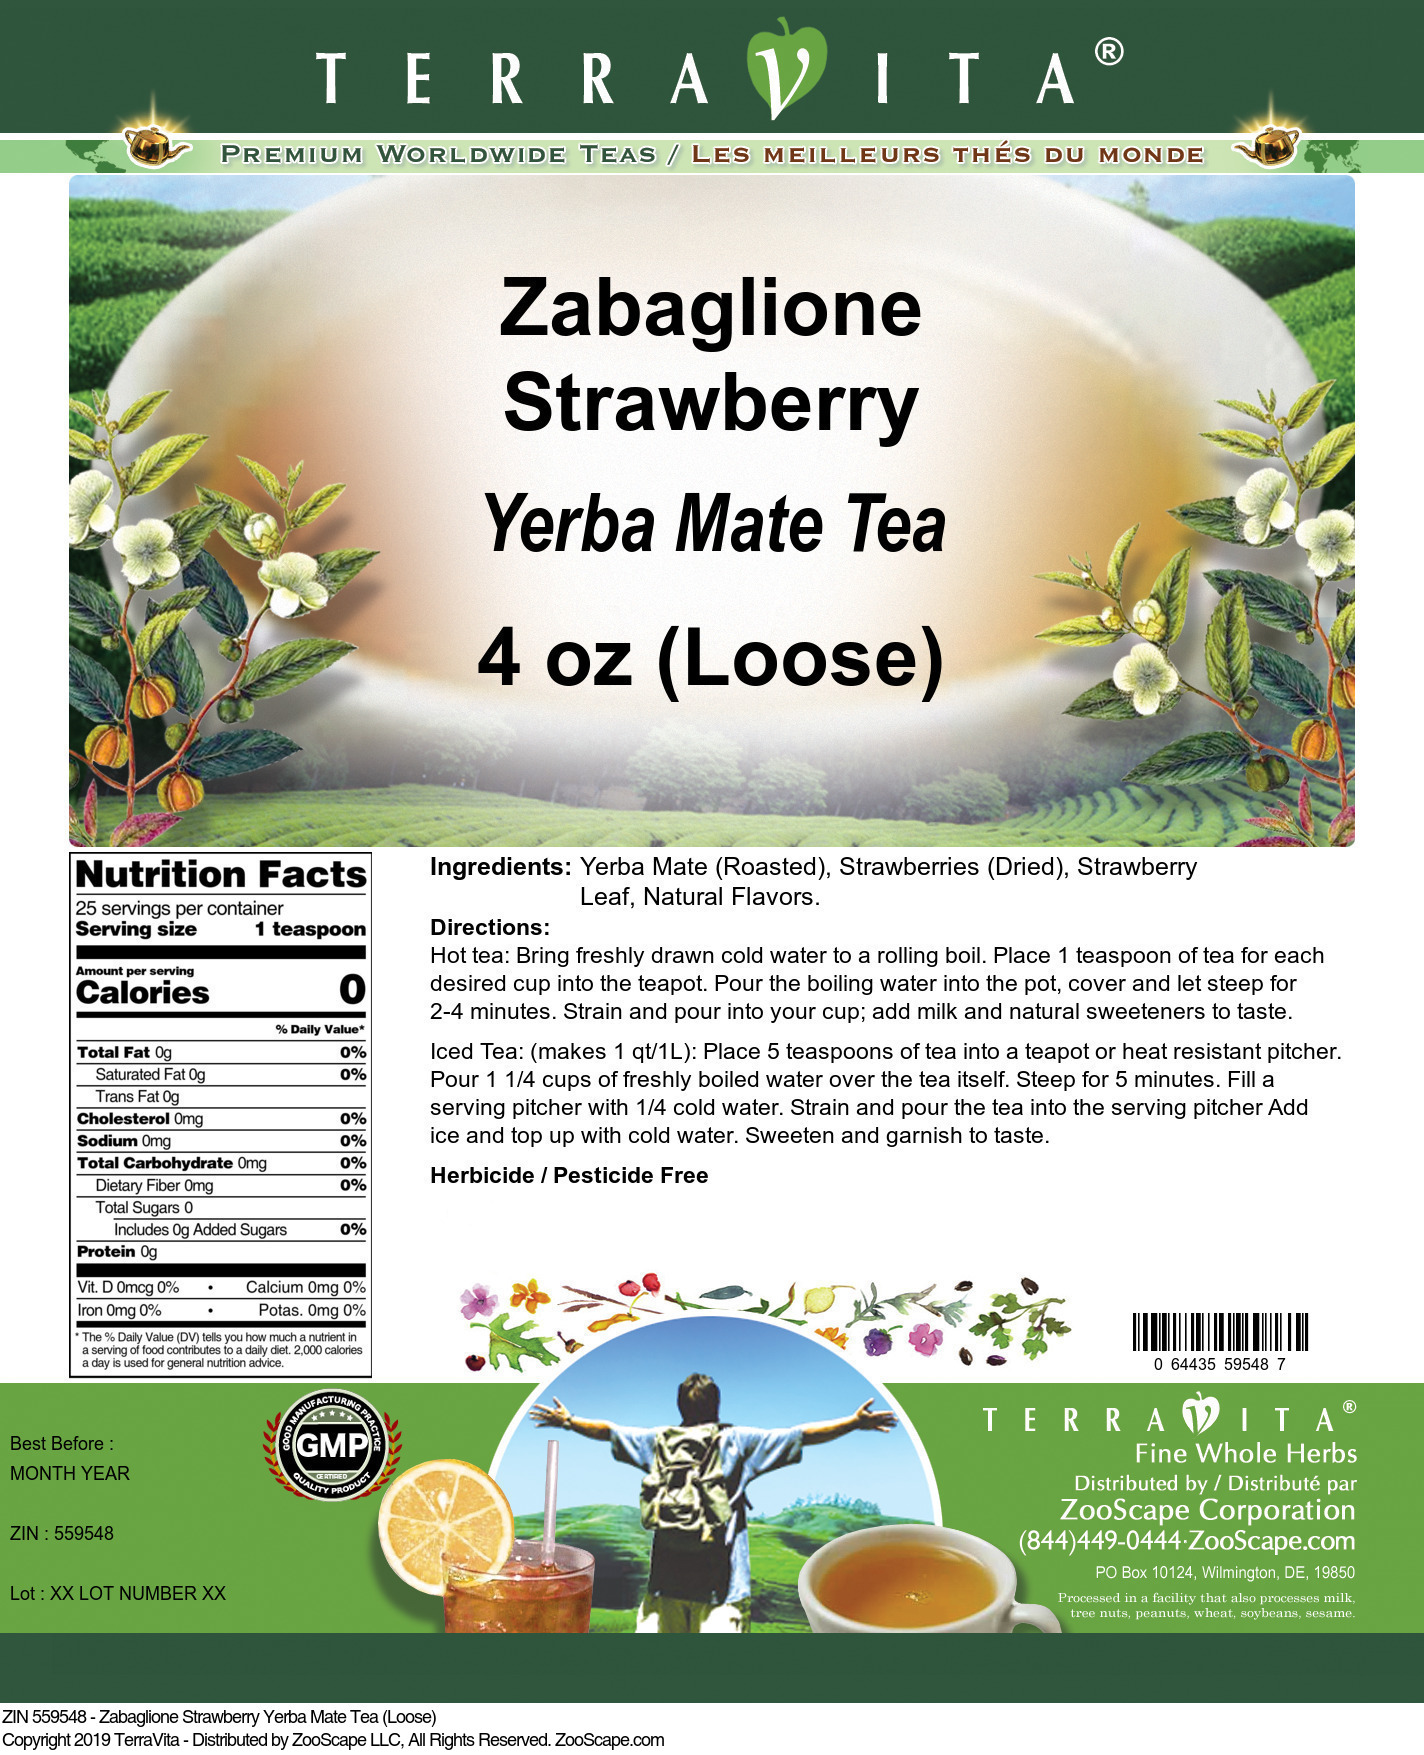 Zabaglione Strawberry Yerba Mate Tea (Loose)